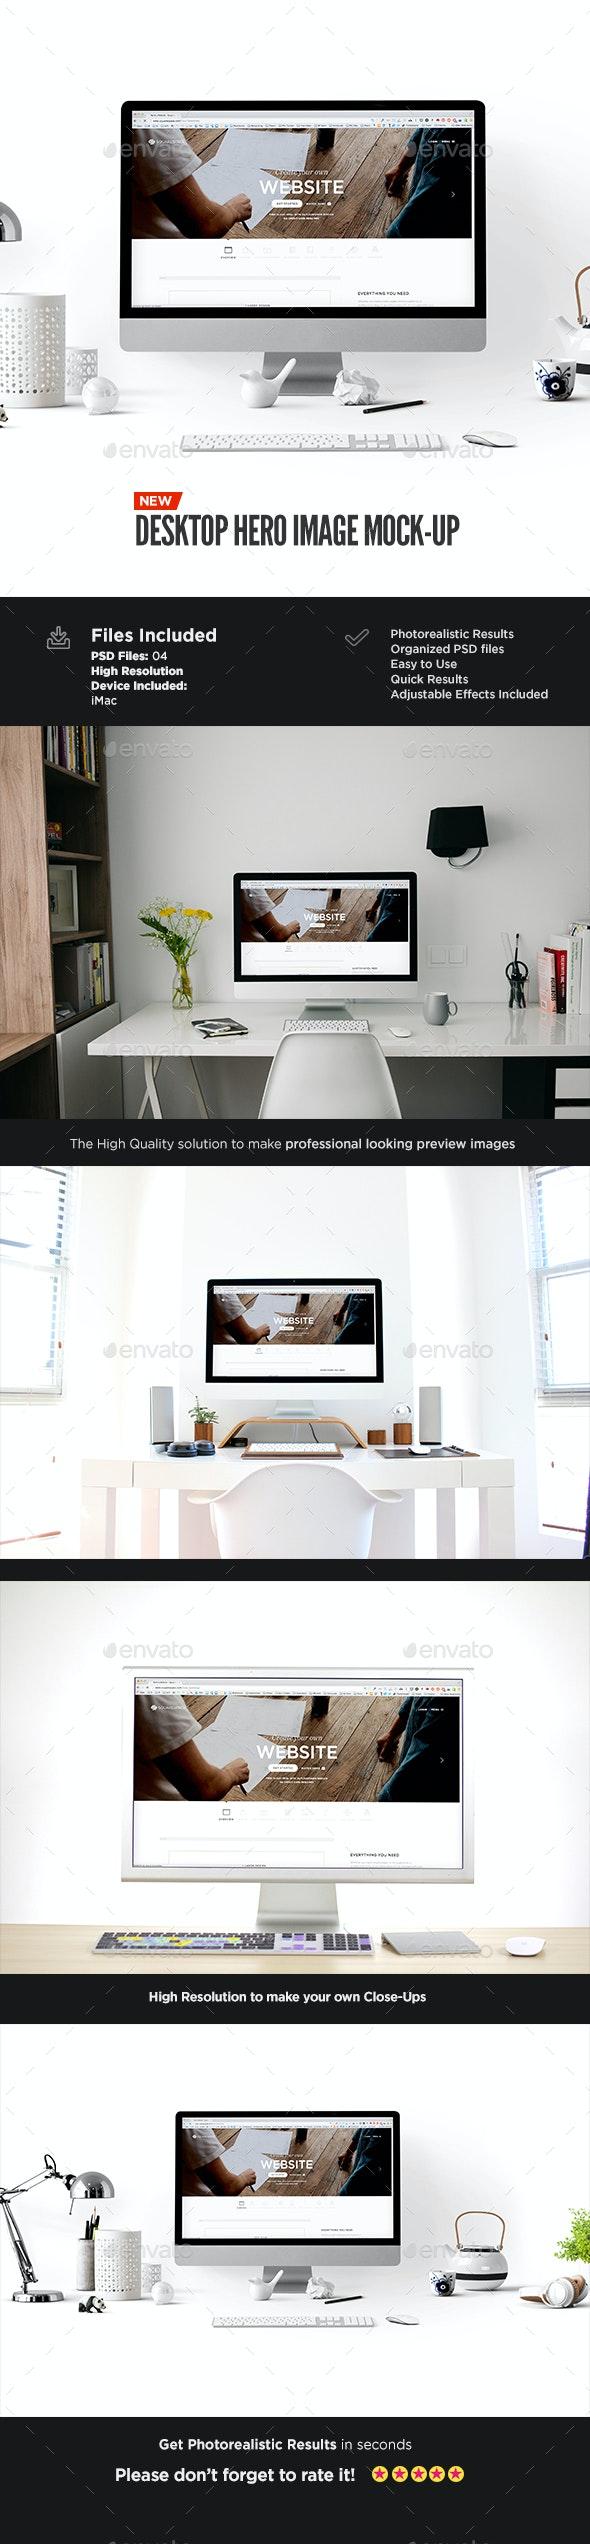 Desktop Display Mock-Up | Hero Image Edition - Displays Product Mock-Ups